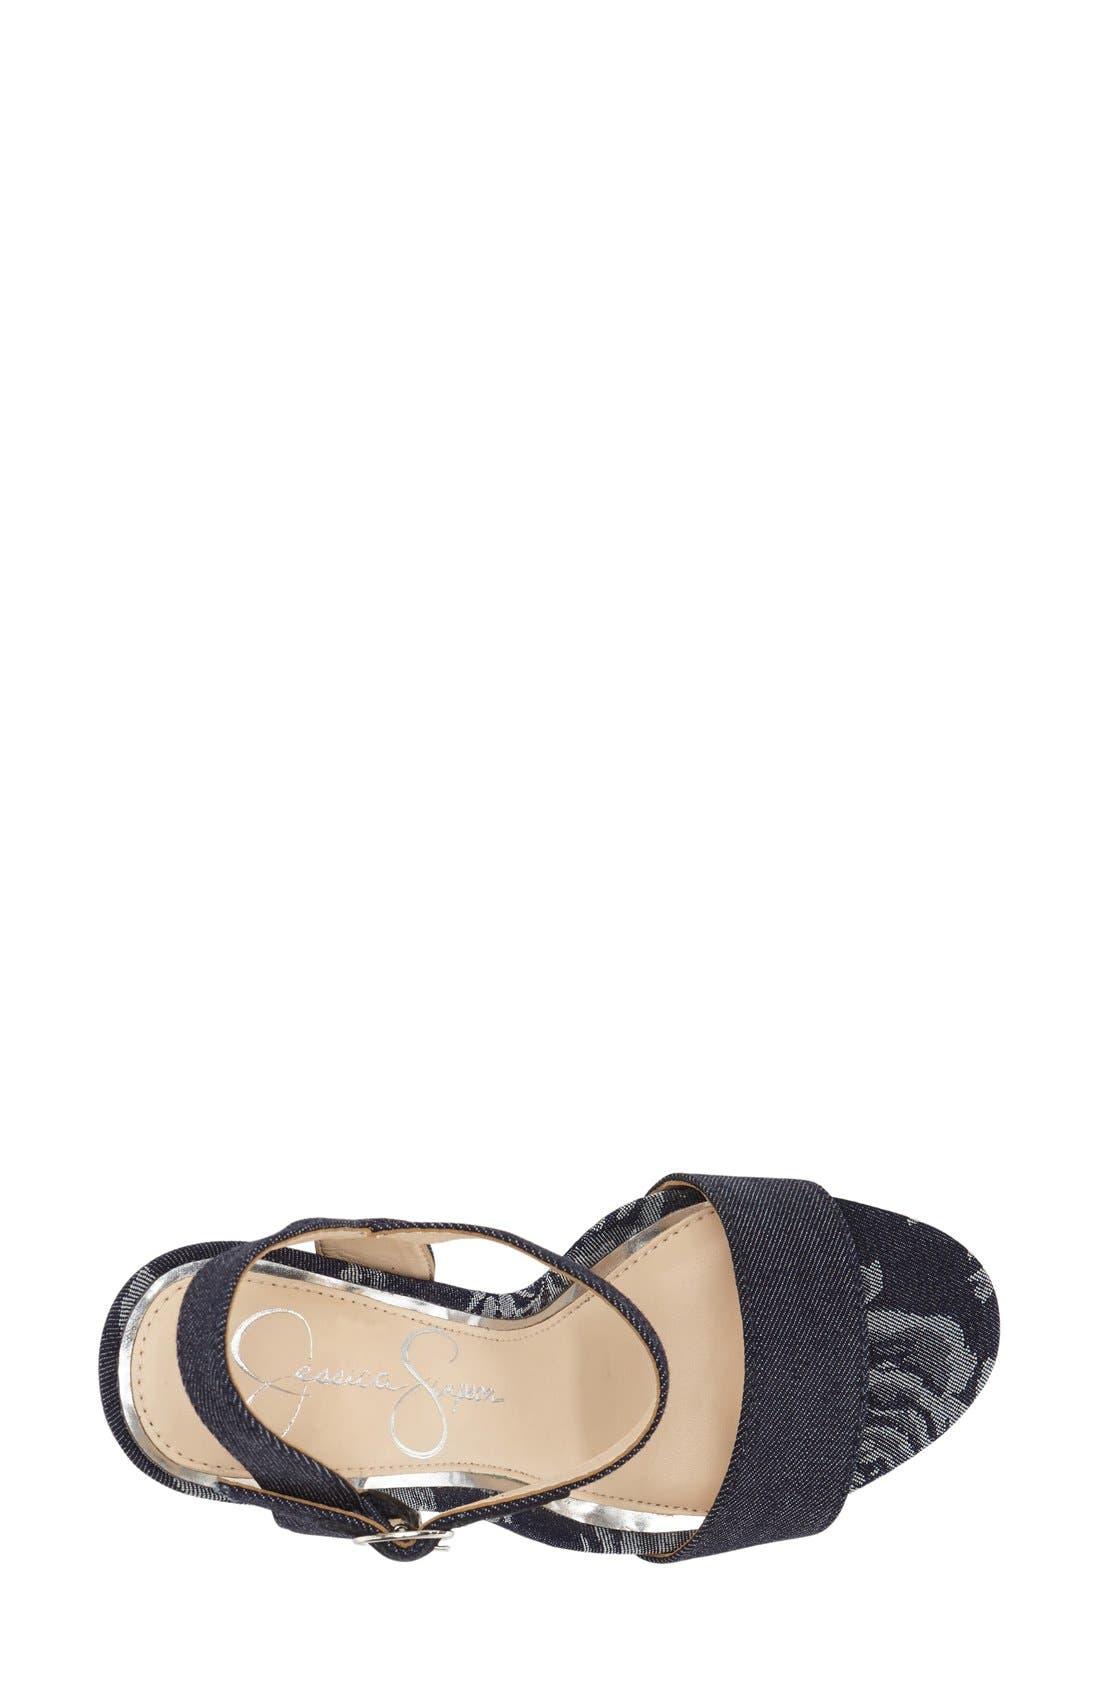 'Blaney' Platform Sandal,                             Alternate thumbnail 3, color,                             Indigo/ Indigo Fabric